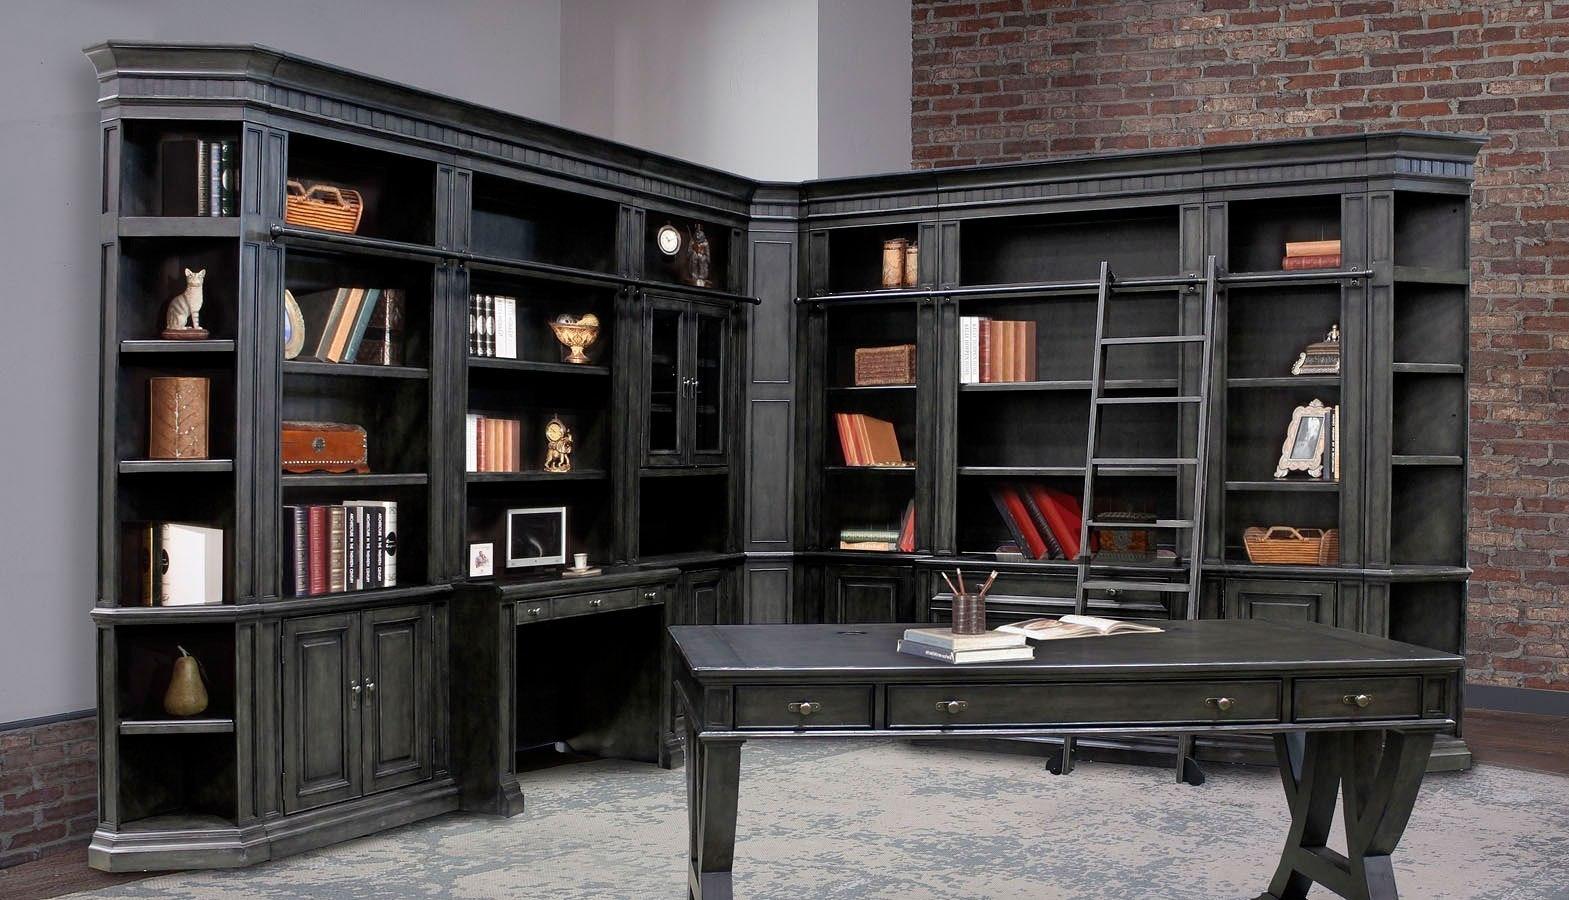 An interior with stylish storage furniture